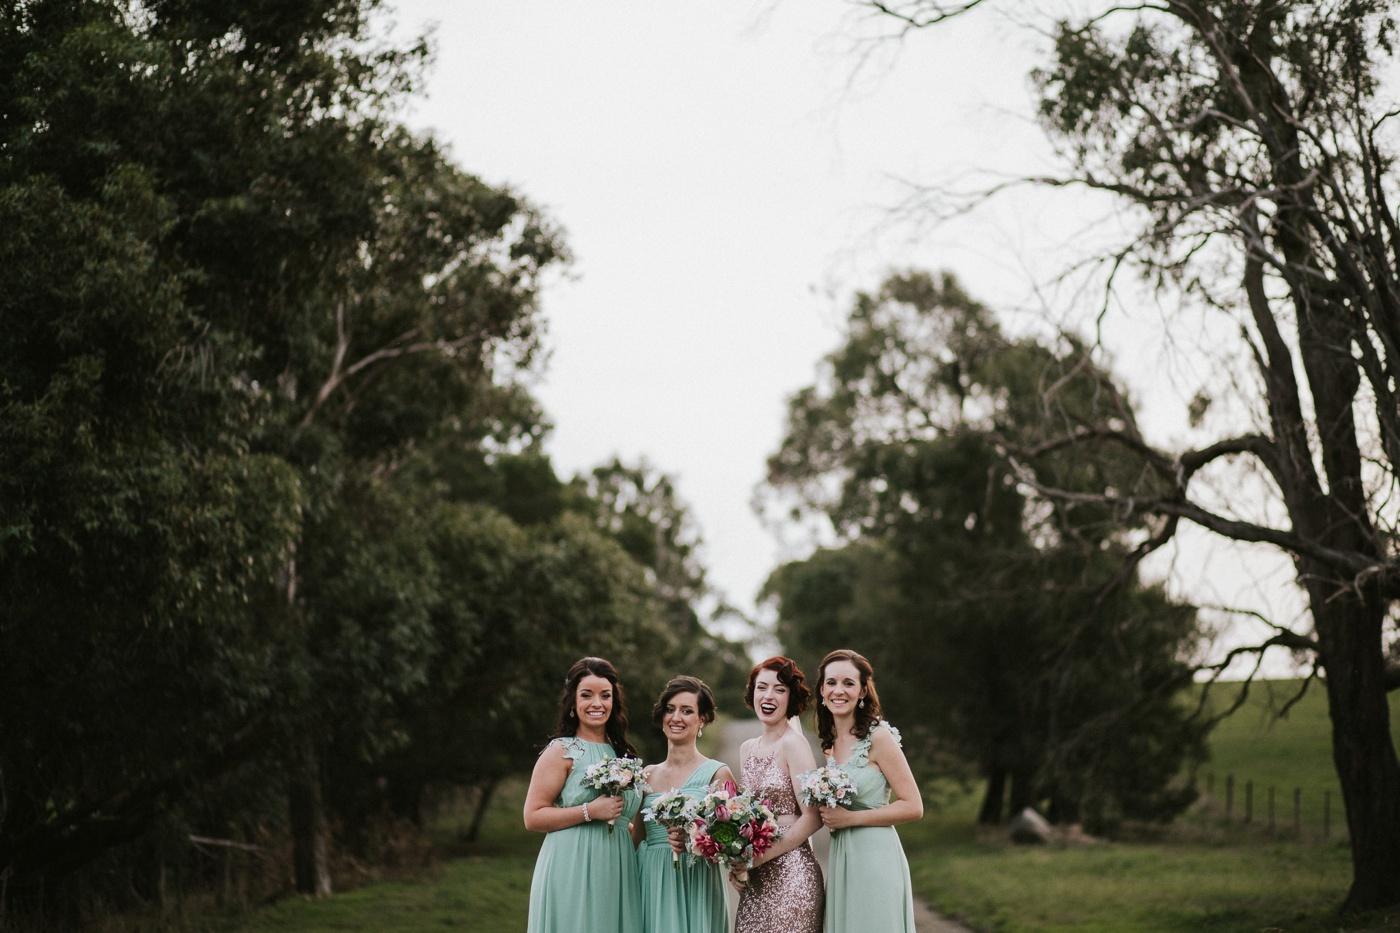 Emma&Morgan_Melbourne-Vintage-Elegant-Fun-Quirky-Yarra-Valley-Vineyard-Wedding_Melbourne-Wedding-Photography-67